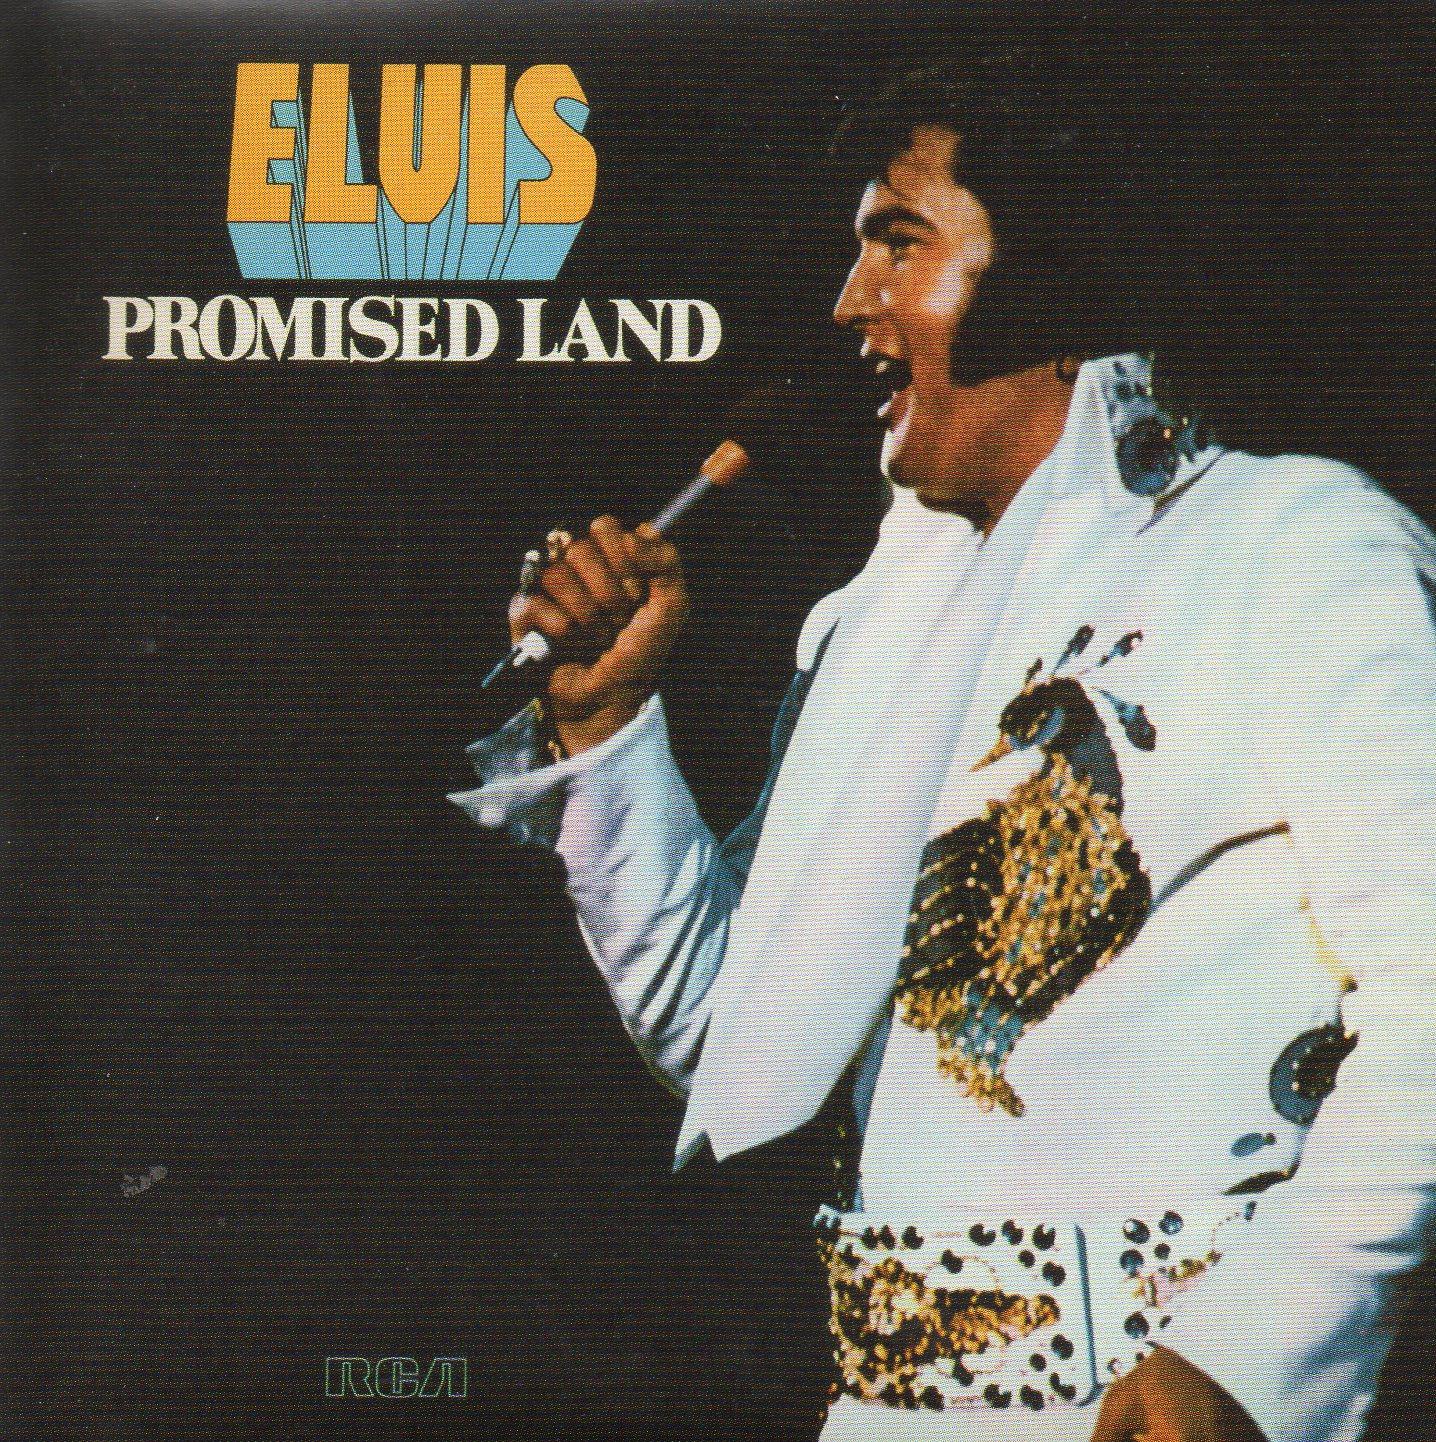 ELVIS PRESLEY - Promised Land  (1975) - Mini LP REPLICA - 18-track CARD SLEEVE - CD